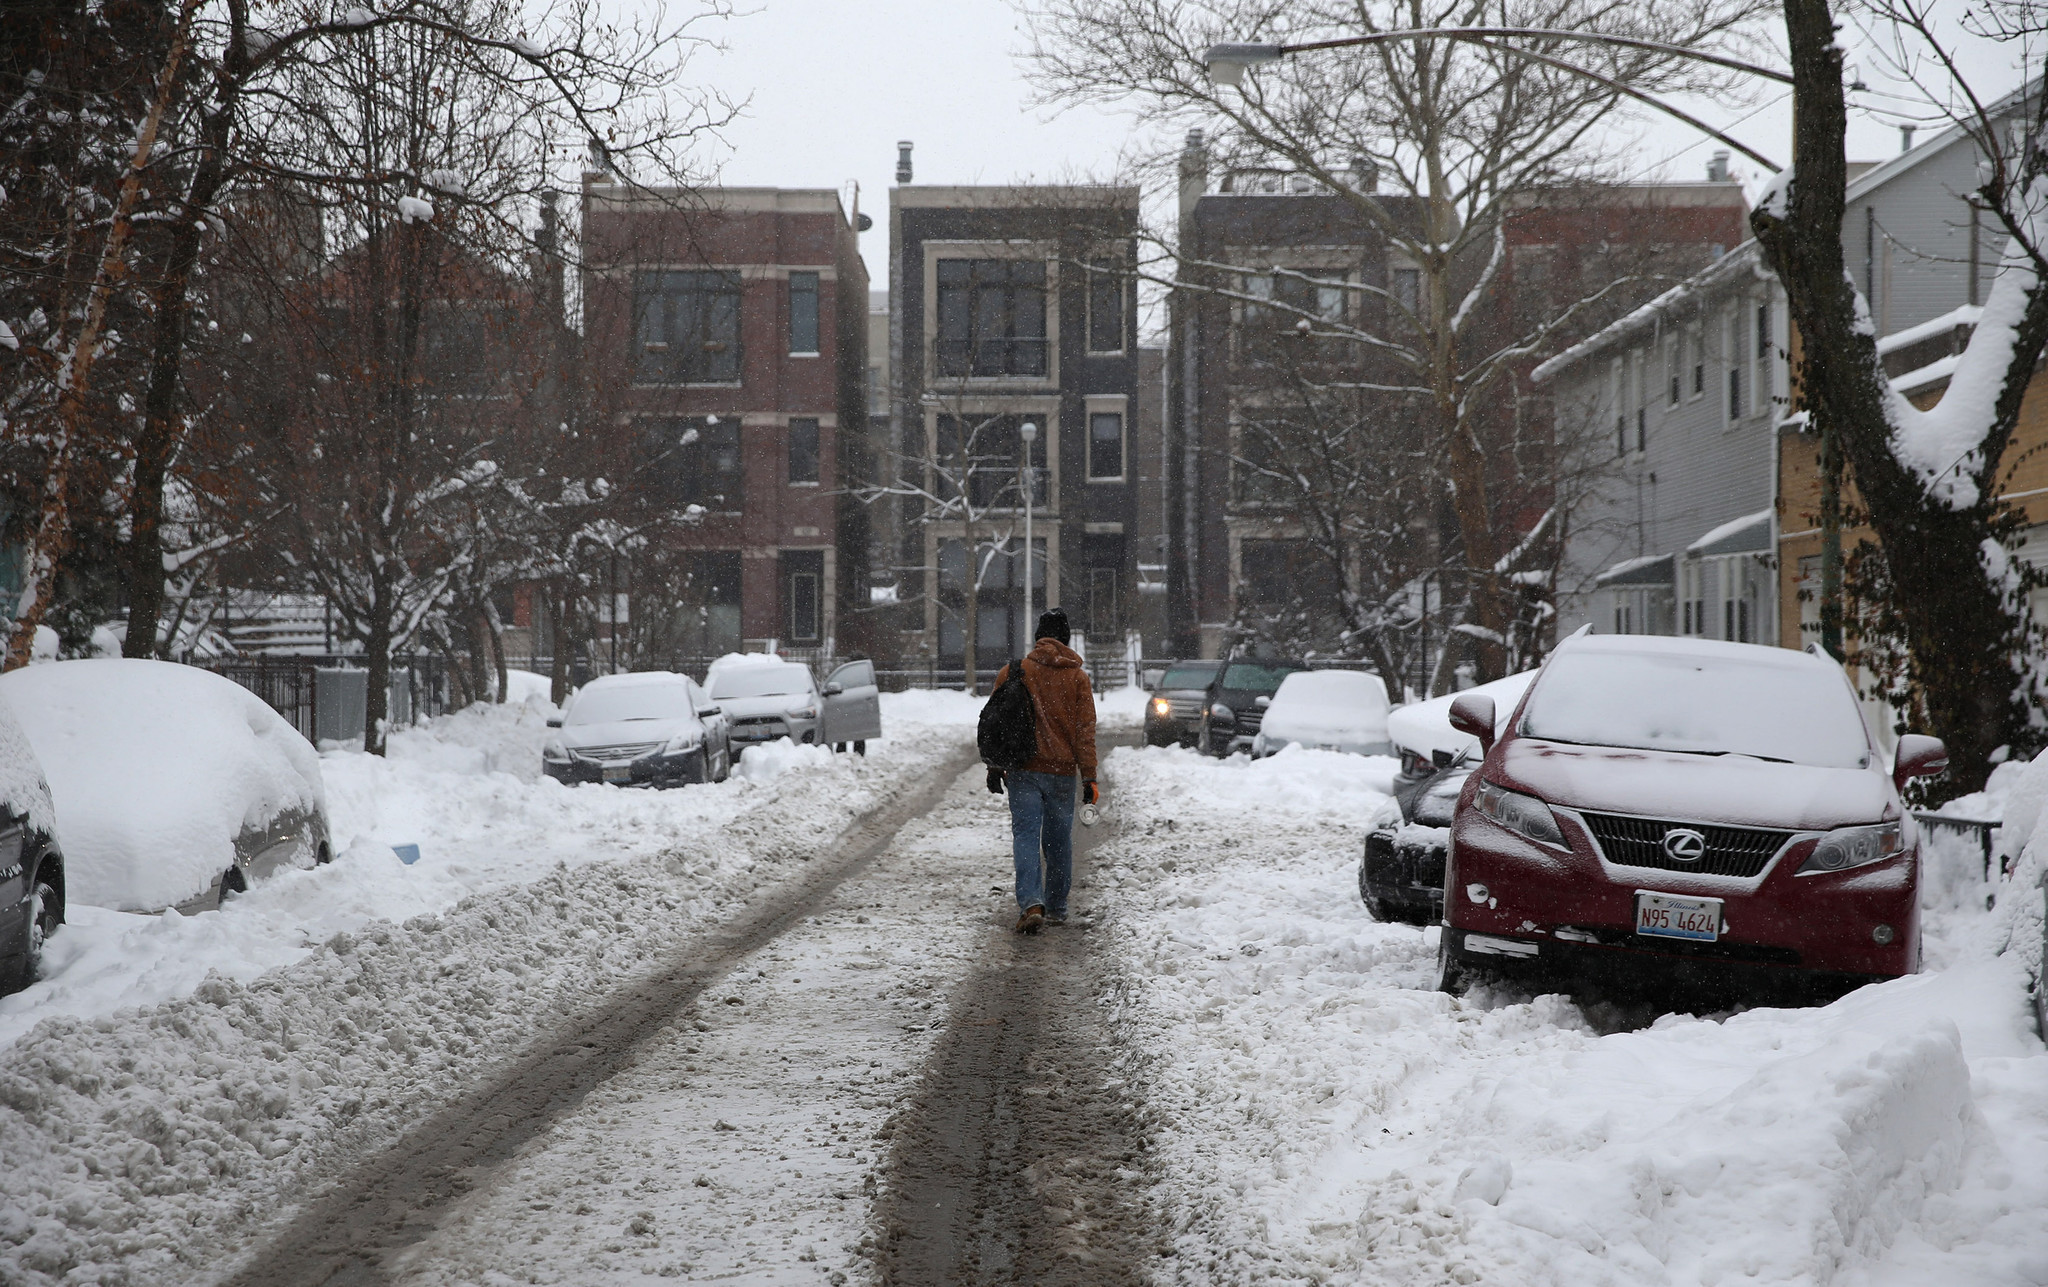 City Chicagoans Prepare For Winter Weather Chicago Tribune